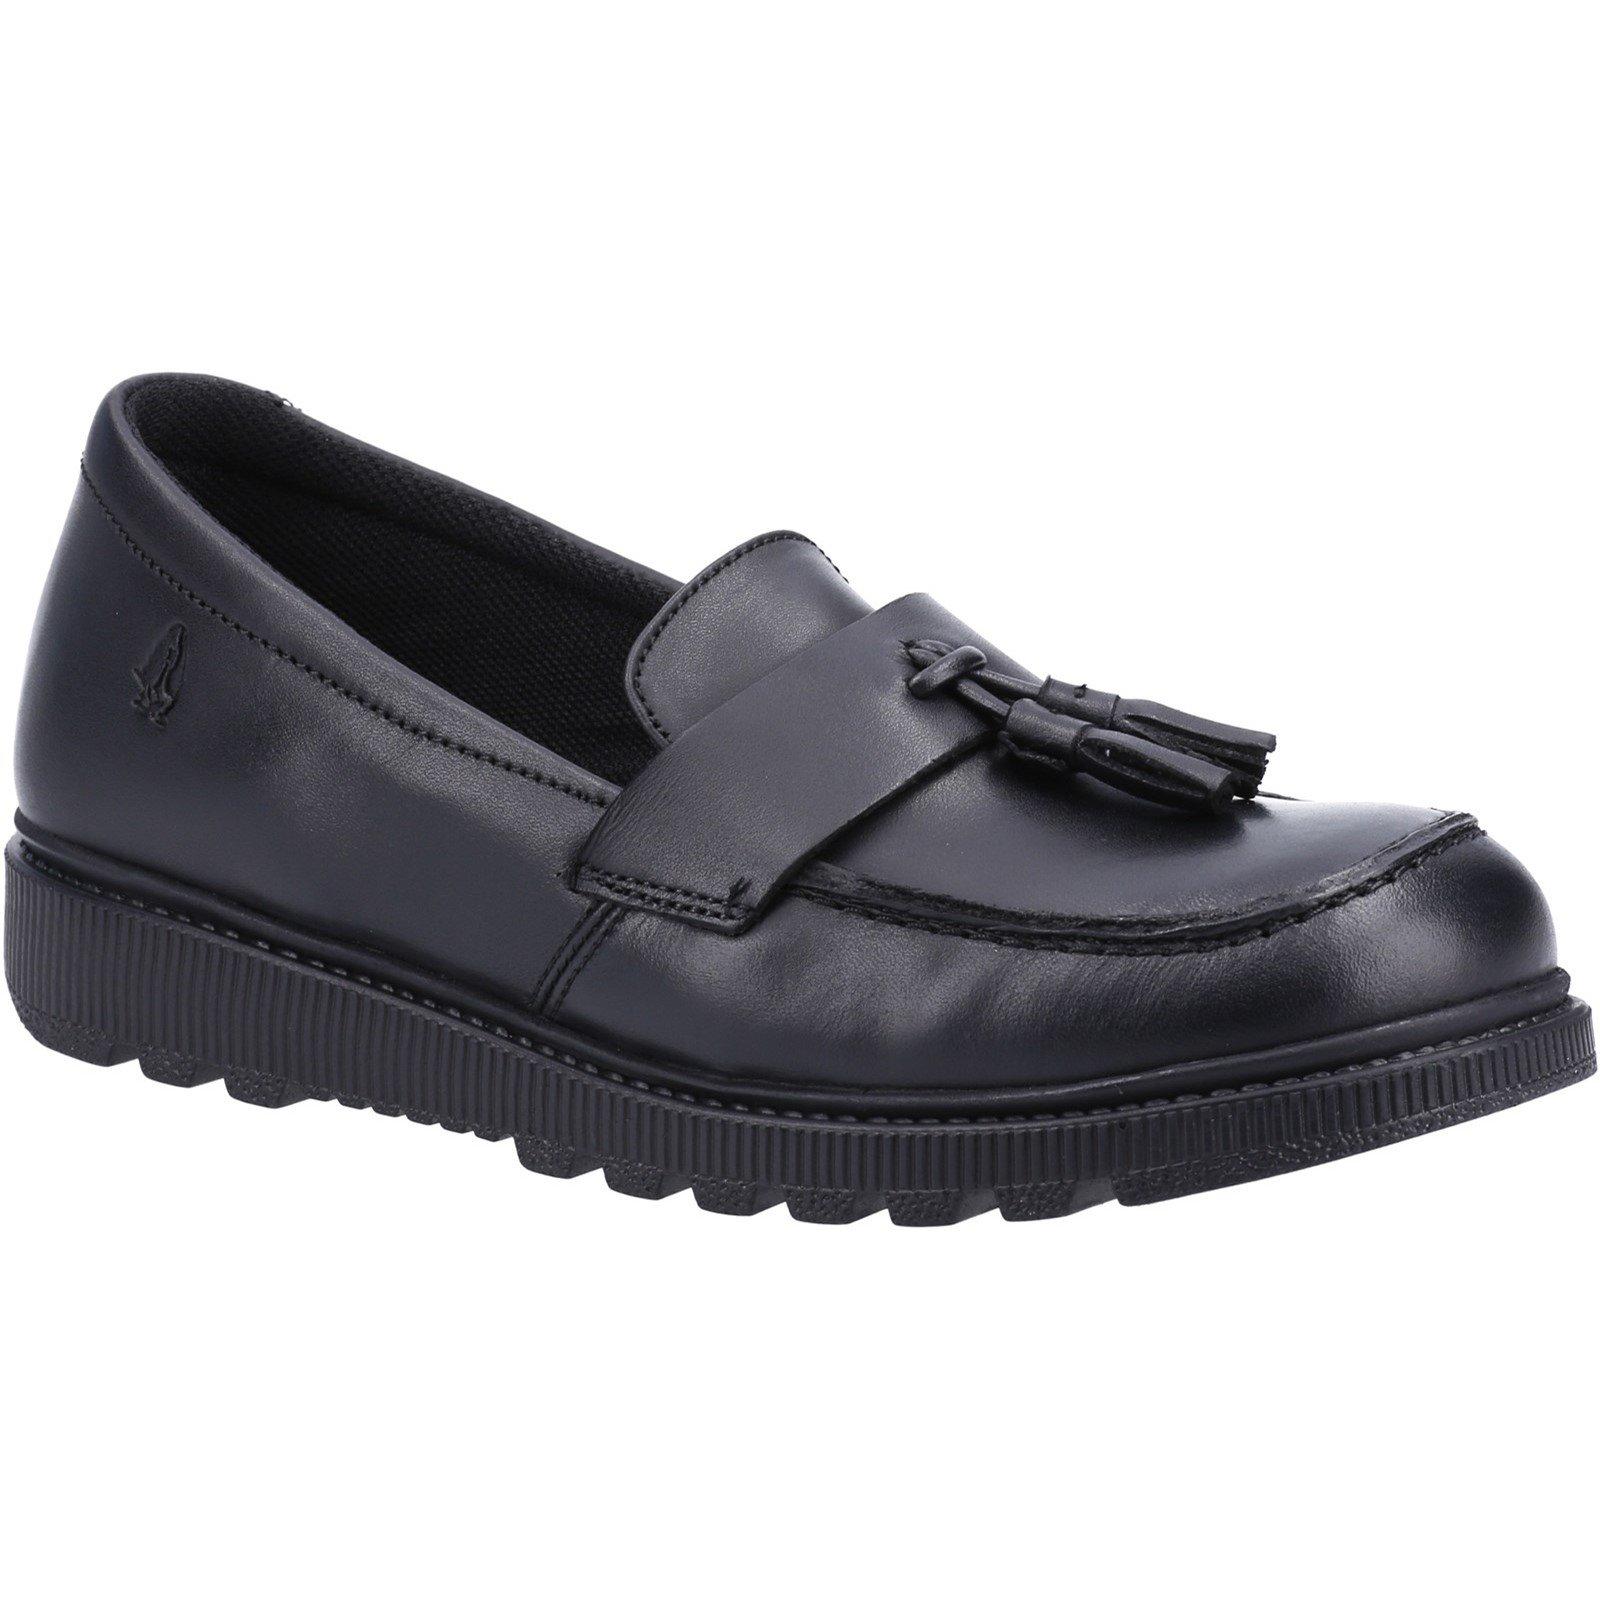 Hush Puppies Kid's Faye Junior School Shoe Black 30843 - Black 11